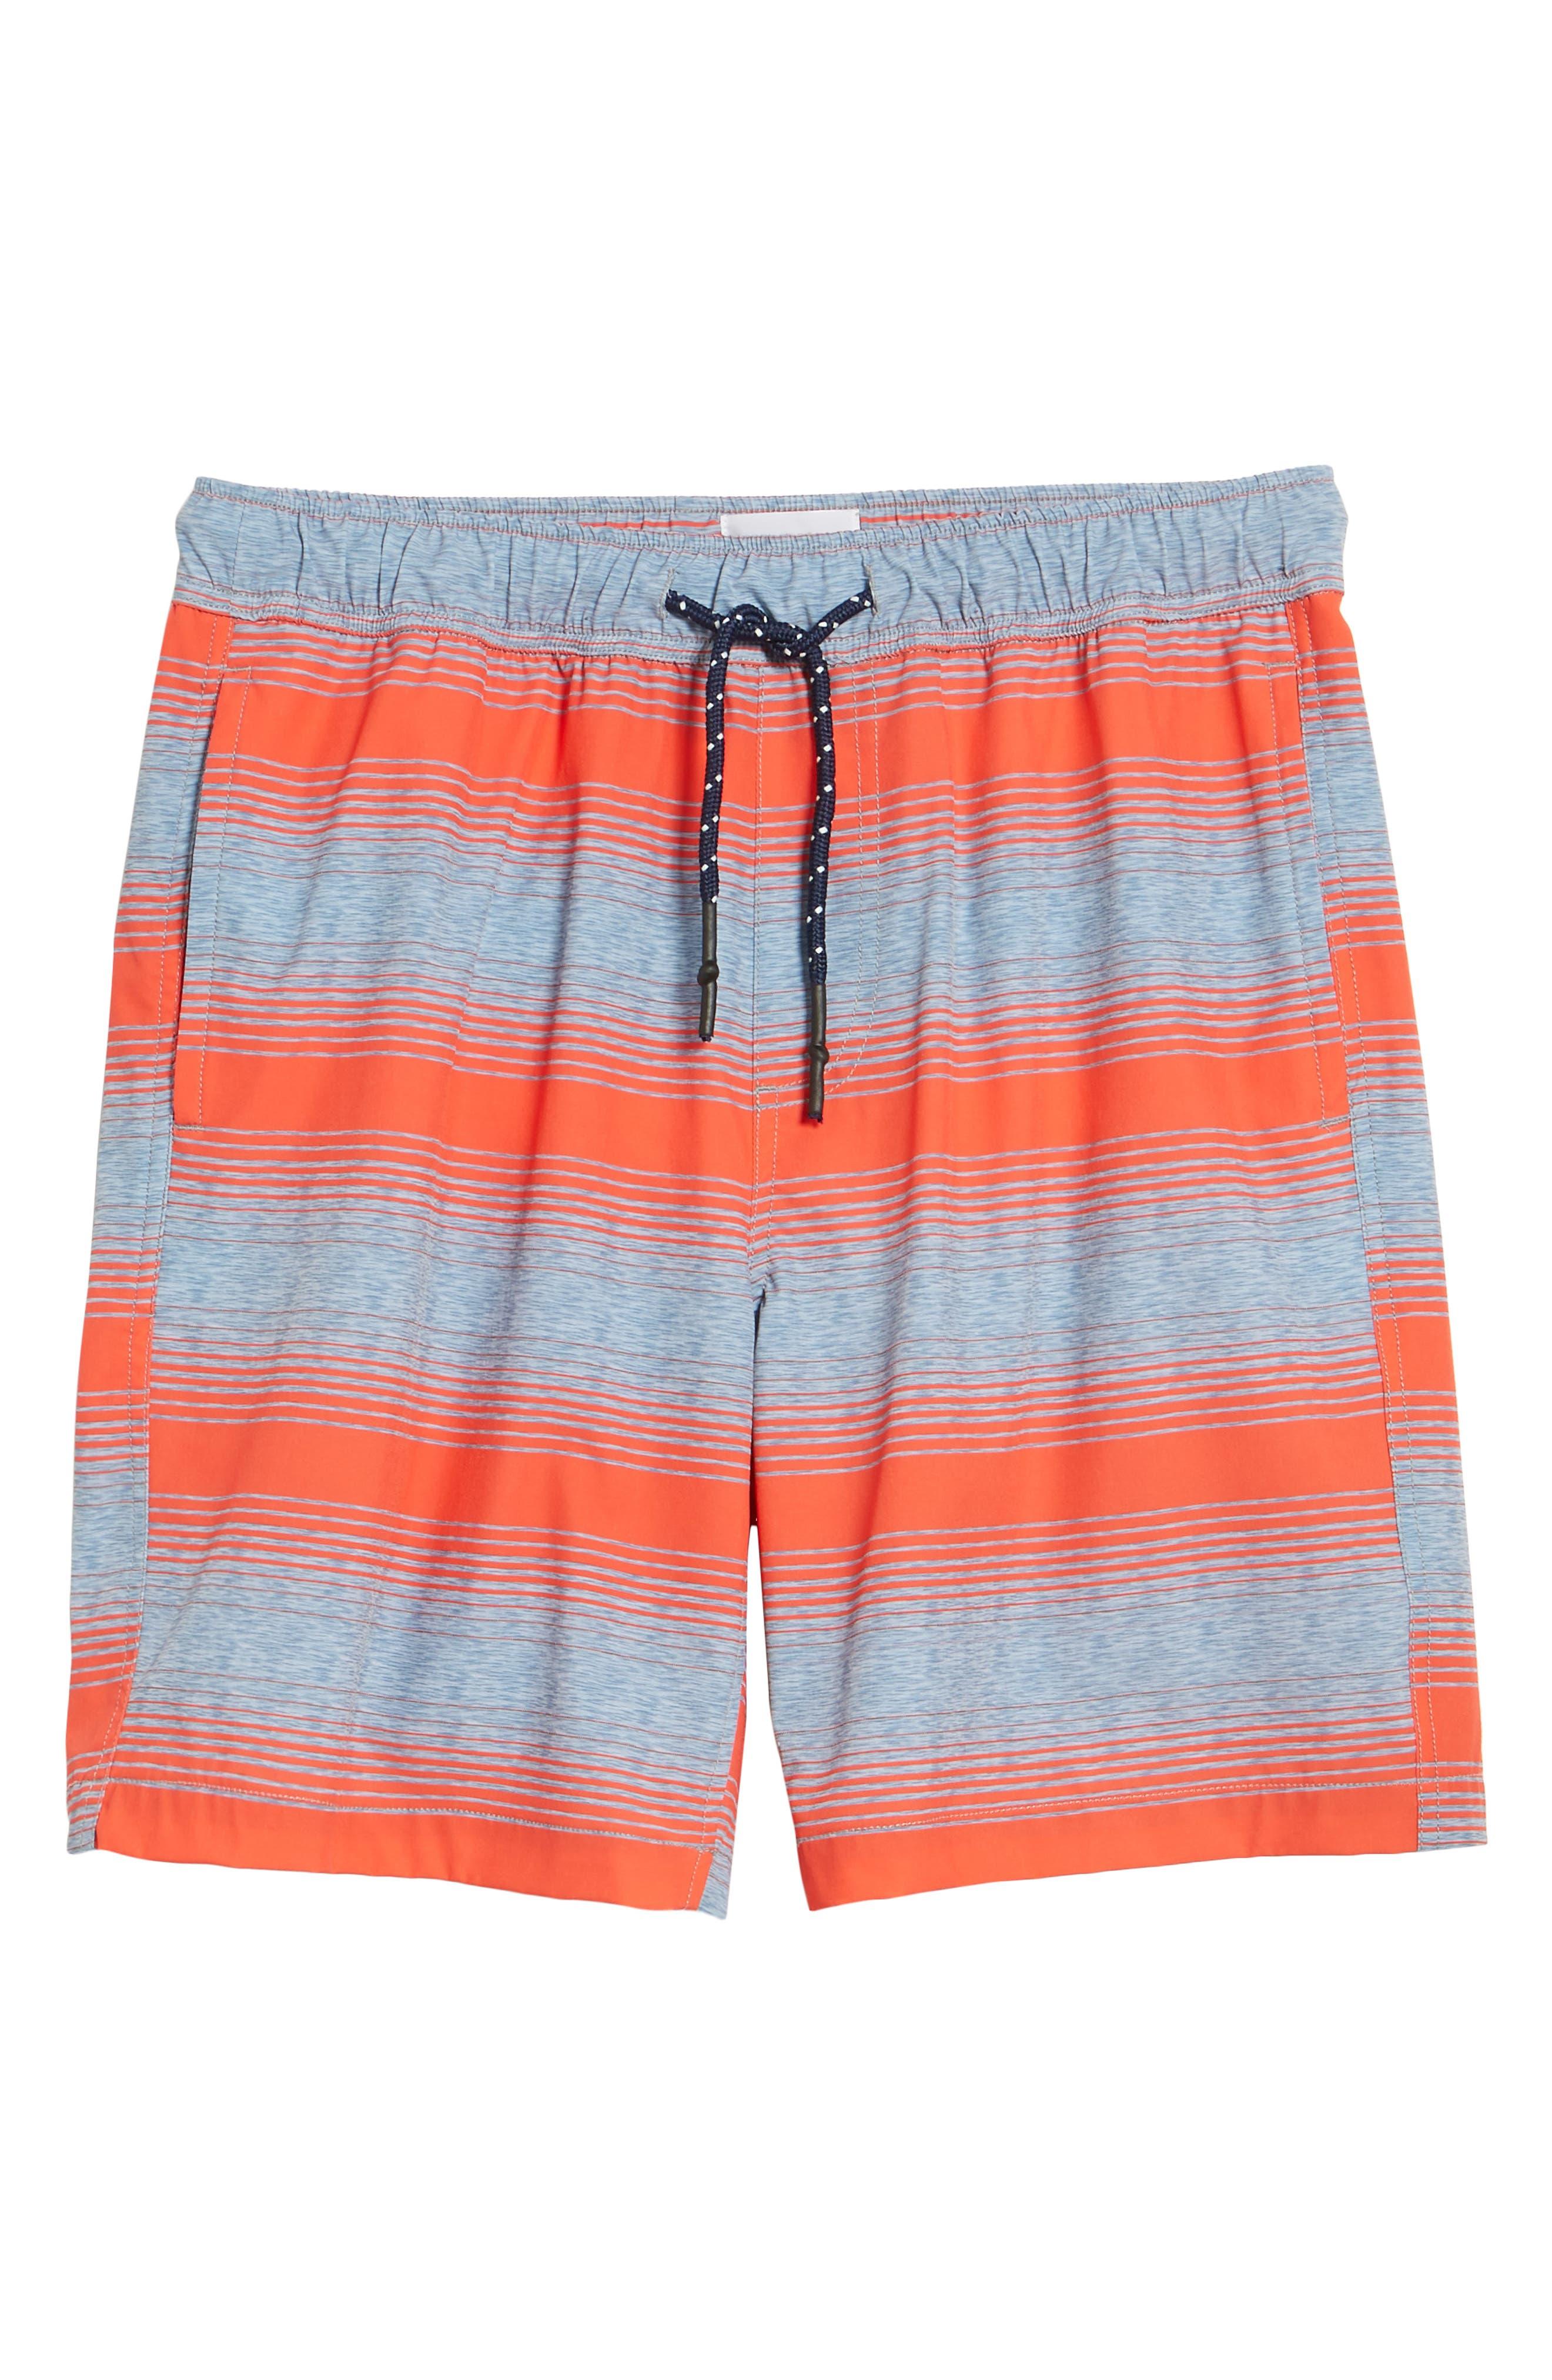 Stripe Swim Trunks,                             Alternate thumbnail 6, color,                             850